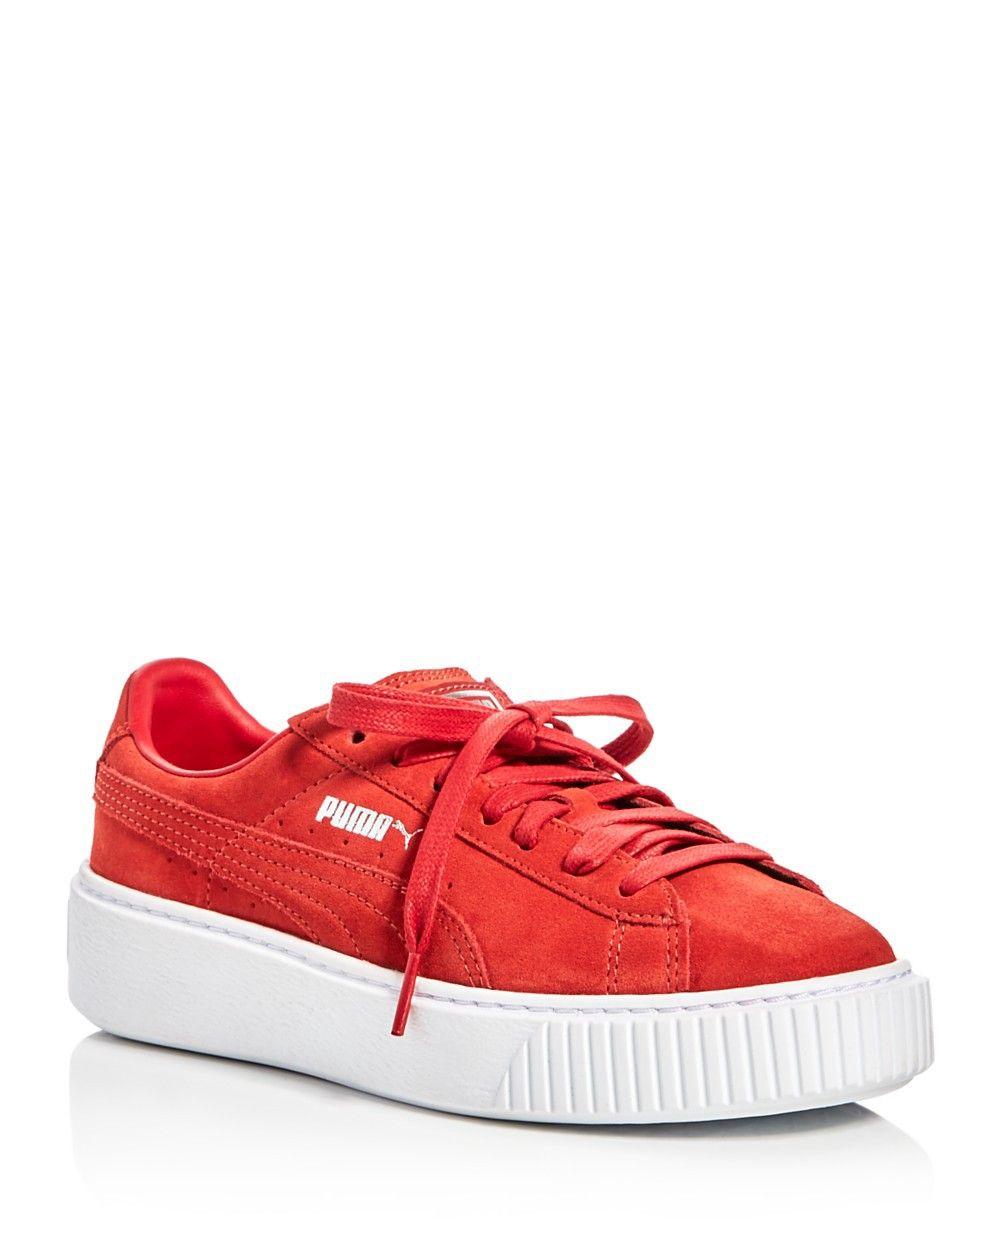 4c4ee3f48222 PUMA PUMA Lace Up Platform Sneakers.  puma  shoes  all